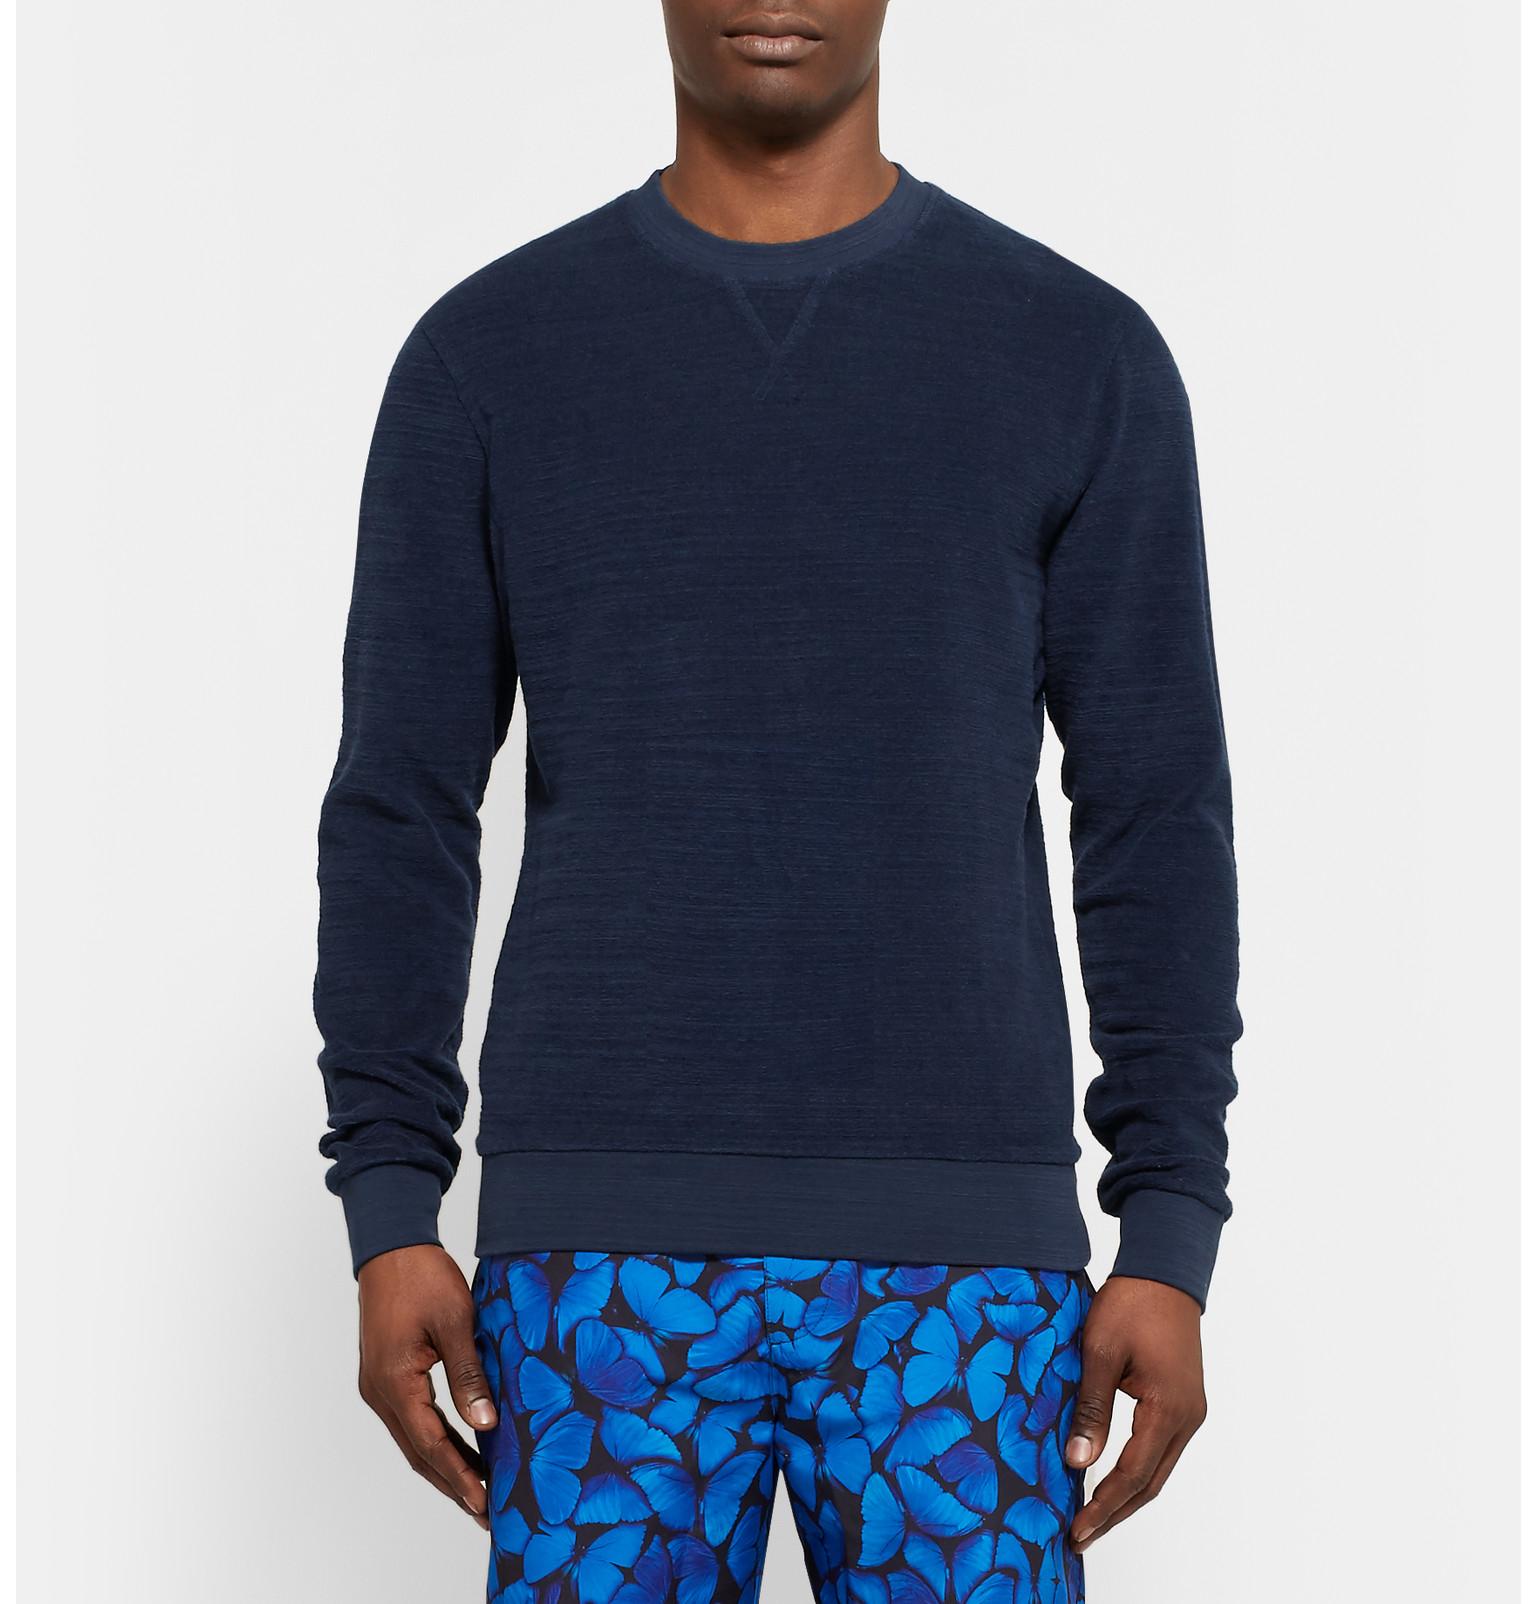 98662d4ae88e4 orlebar-brown-storm-blue-pierce-cotton-terry -sweatshirt-blue-product-4-588734114-normal.jpeg